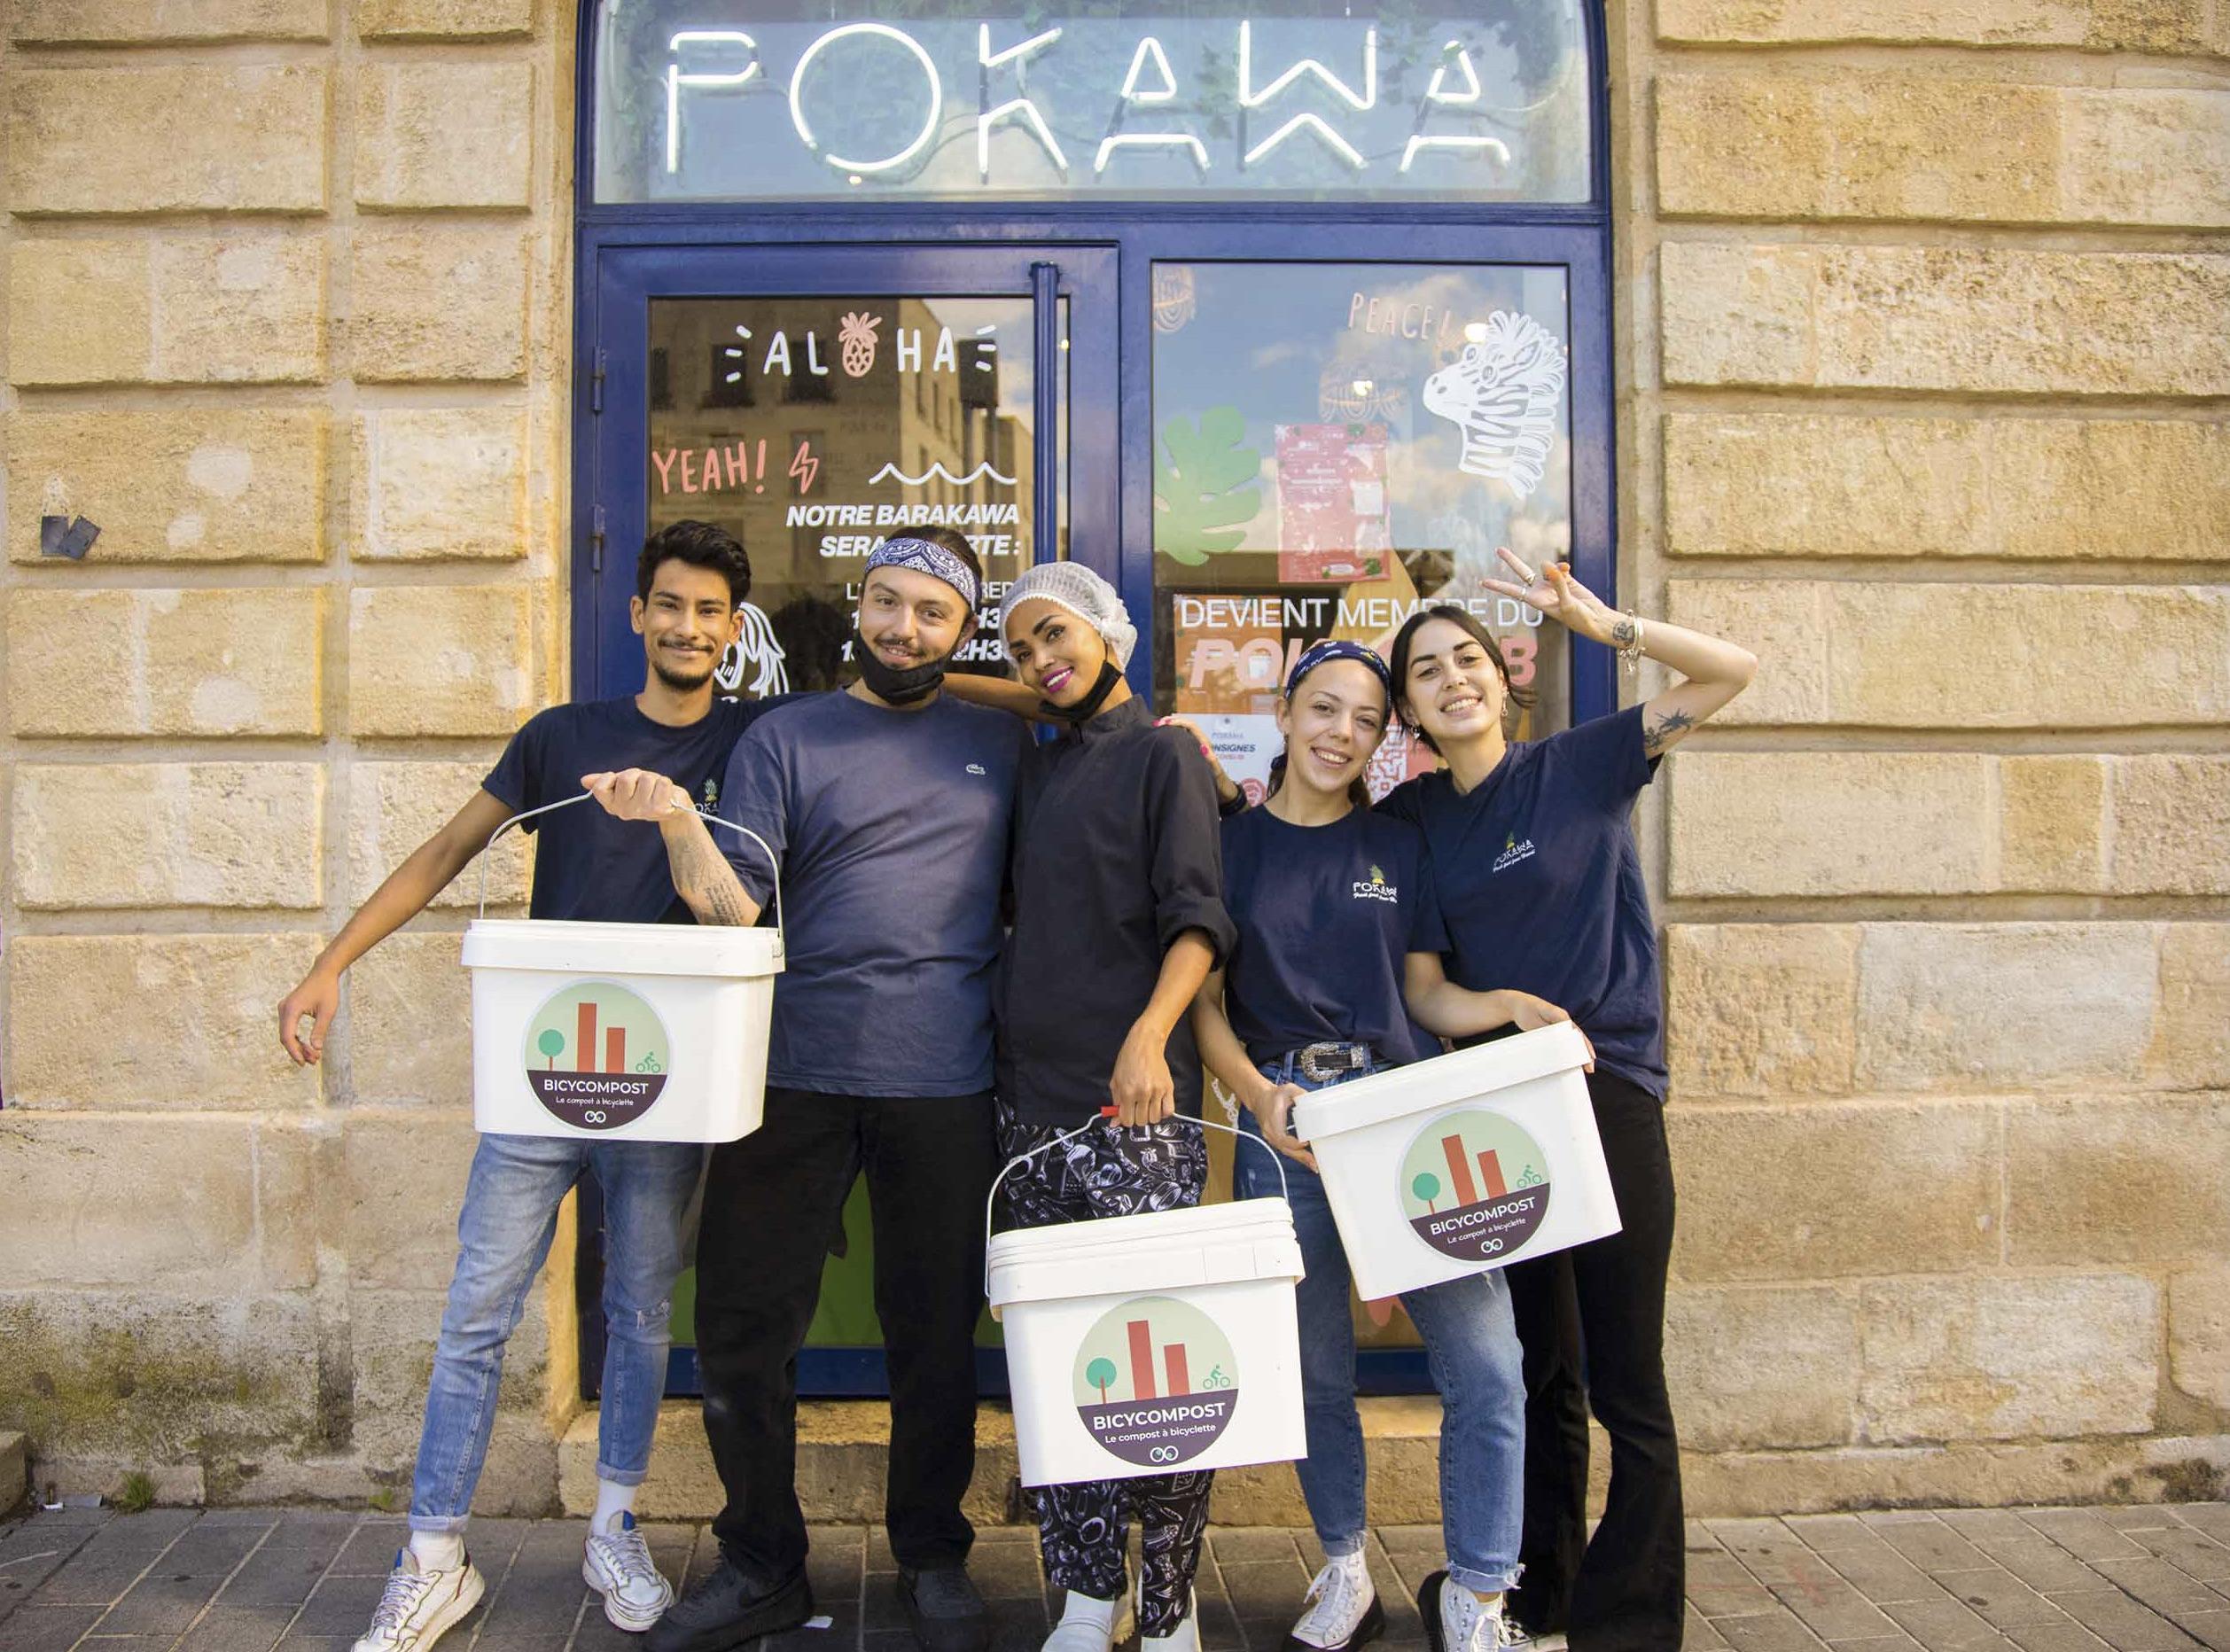 Pokawa : Restaurant de pokés éco-responsable à Bordeaux